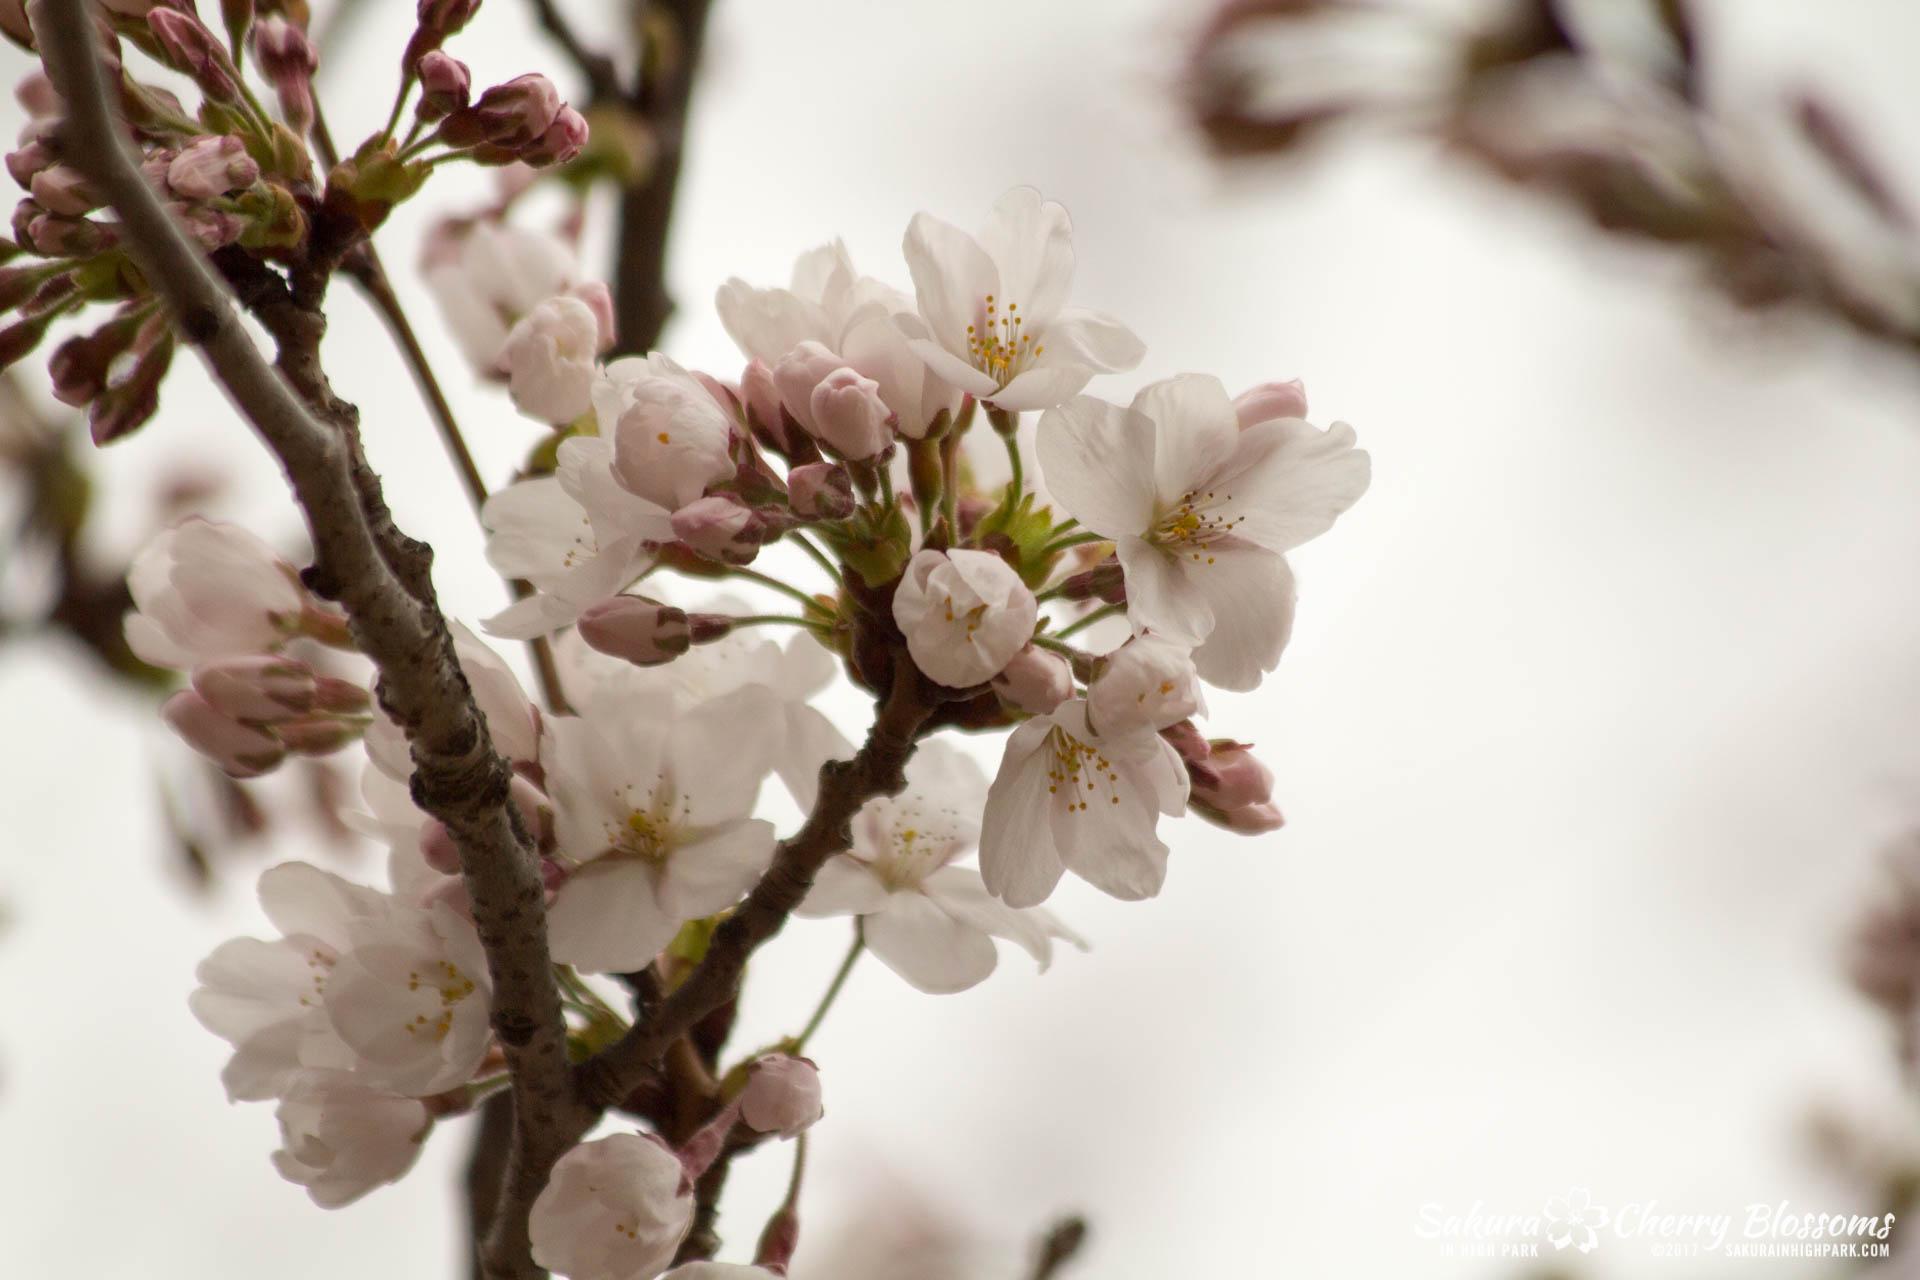 Sakura-Watch-April-21-2017-bloom-still-in-early-stages-64.jpg